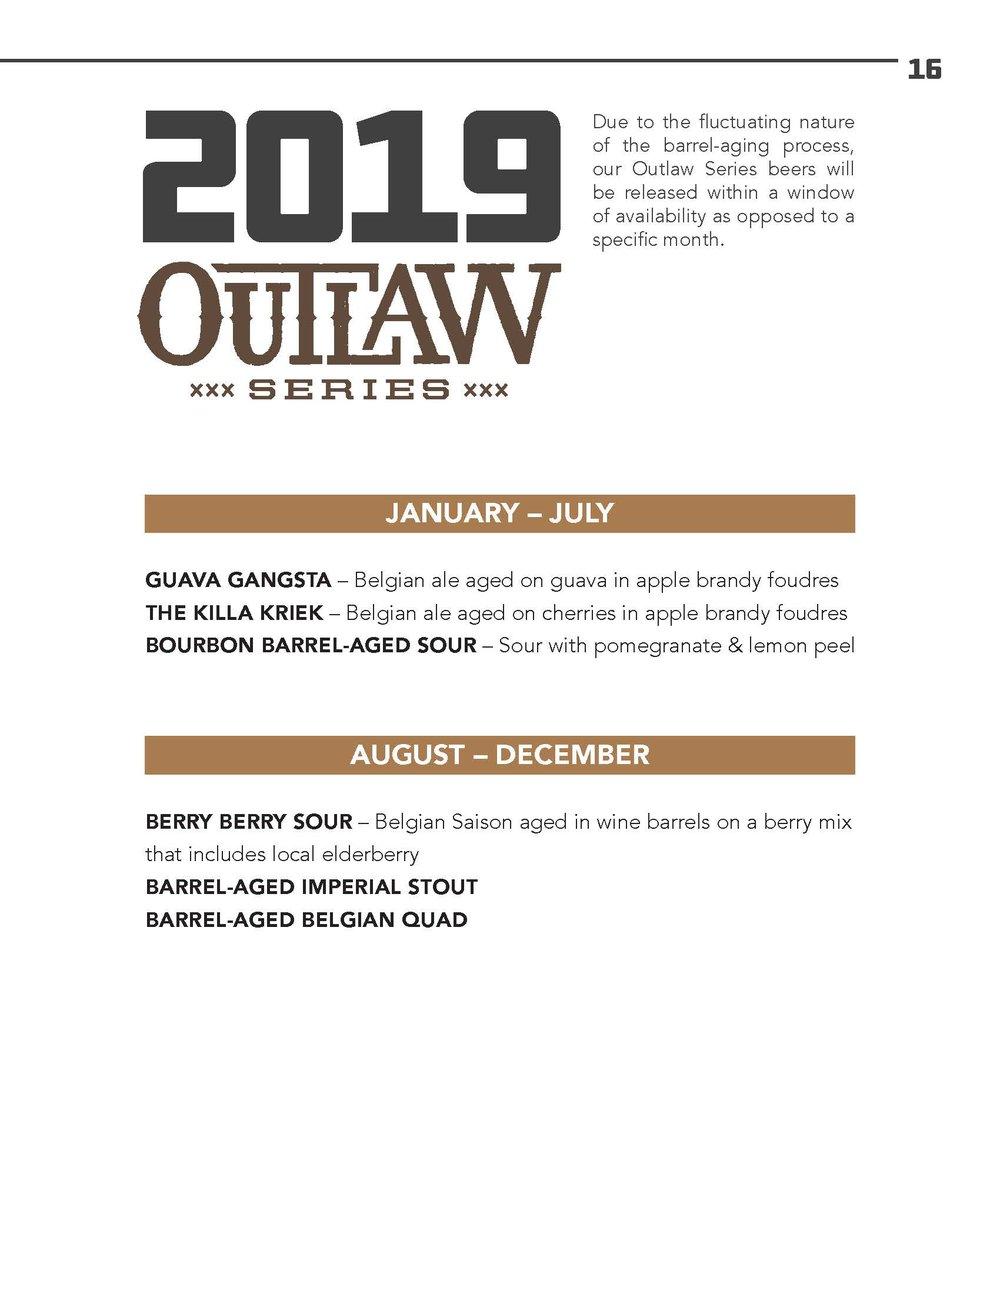 2019 Outlaw Series Calendar.jpg